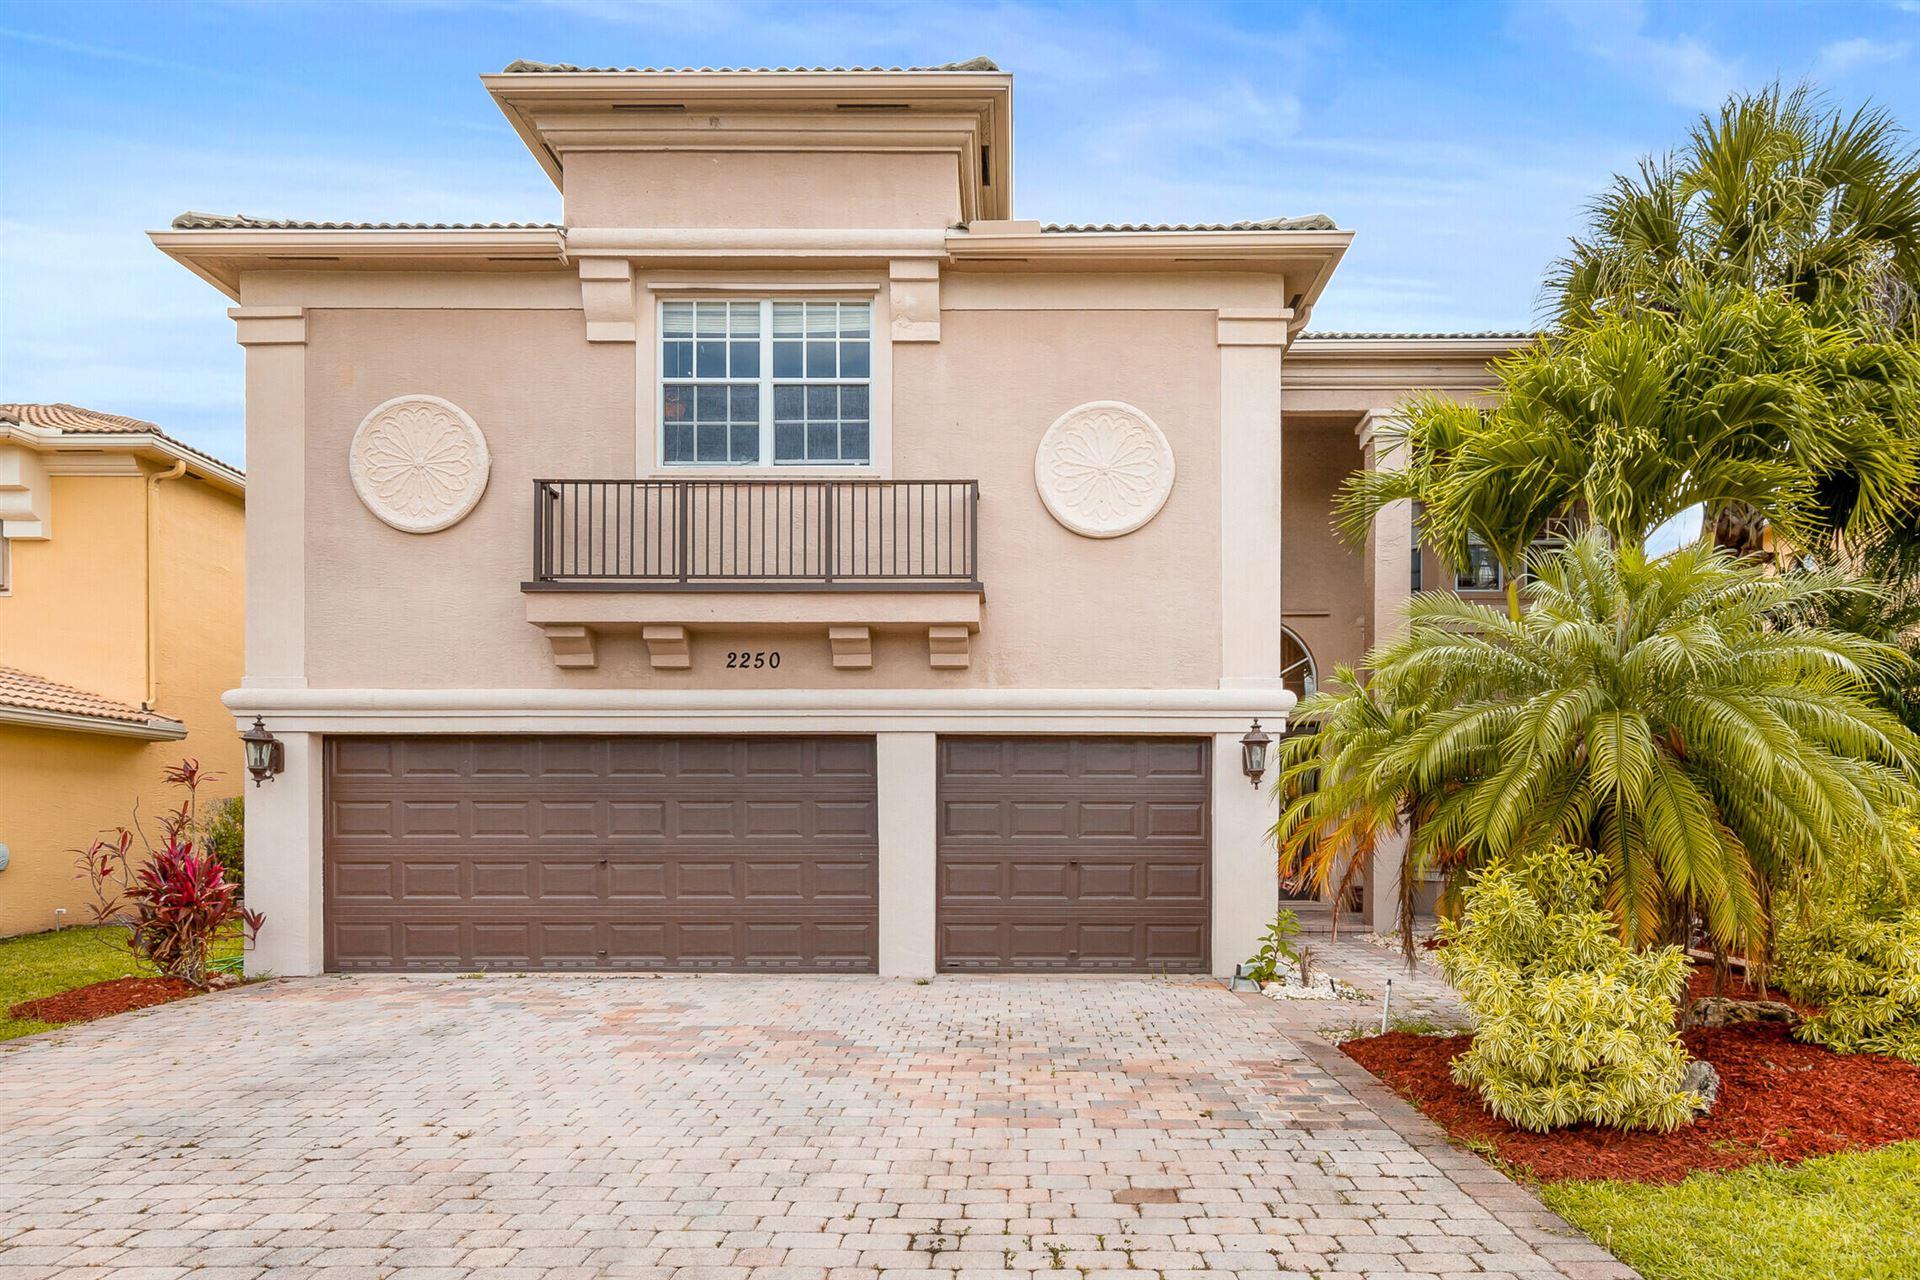 2250 Ridgewood Court, Royal Palm Beach, FL 33411 - #: RX-10726143